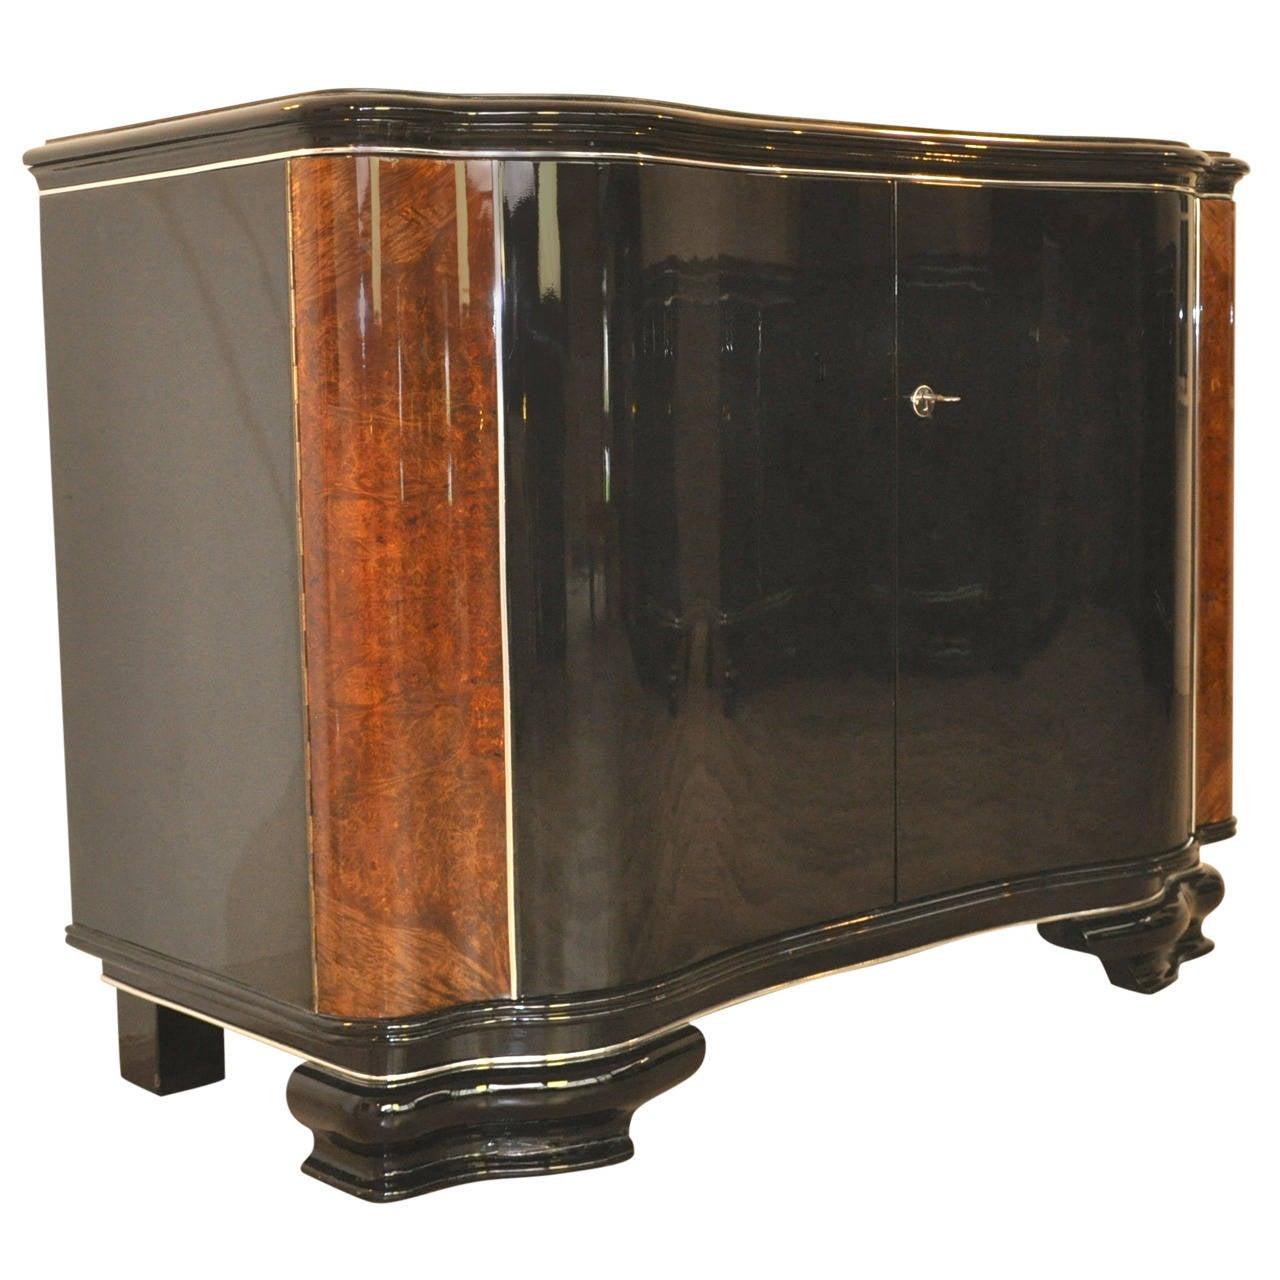 extravagant and elegant art deco commode at 1stdibs. Black Bedroom Furniture Sets. Home Design Ideas